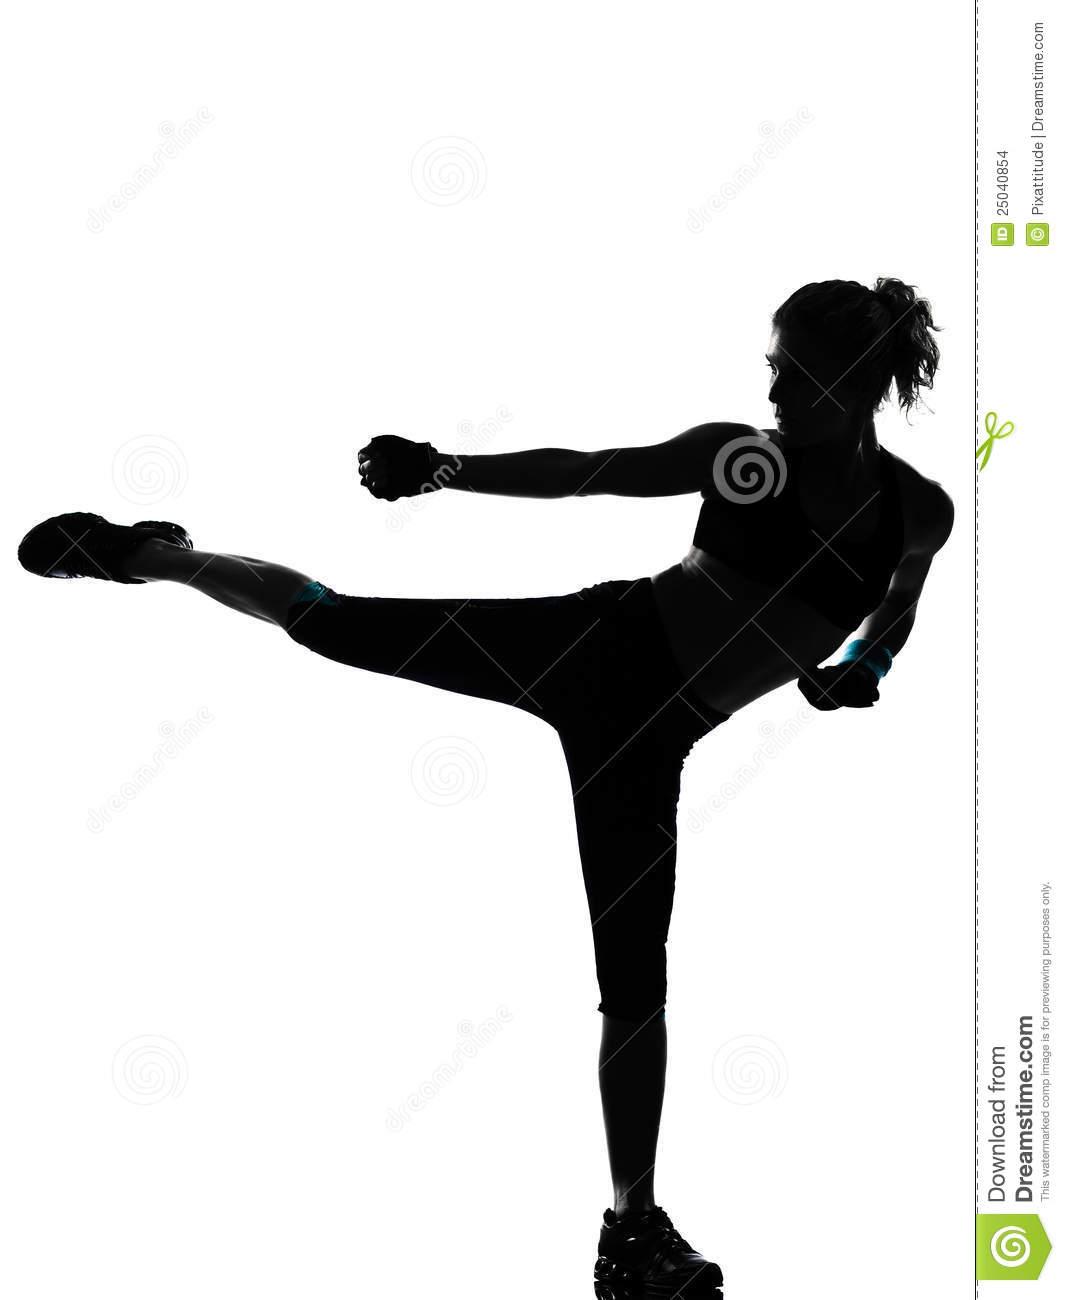 Woman Kickboxing Silhouette